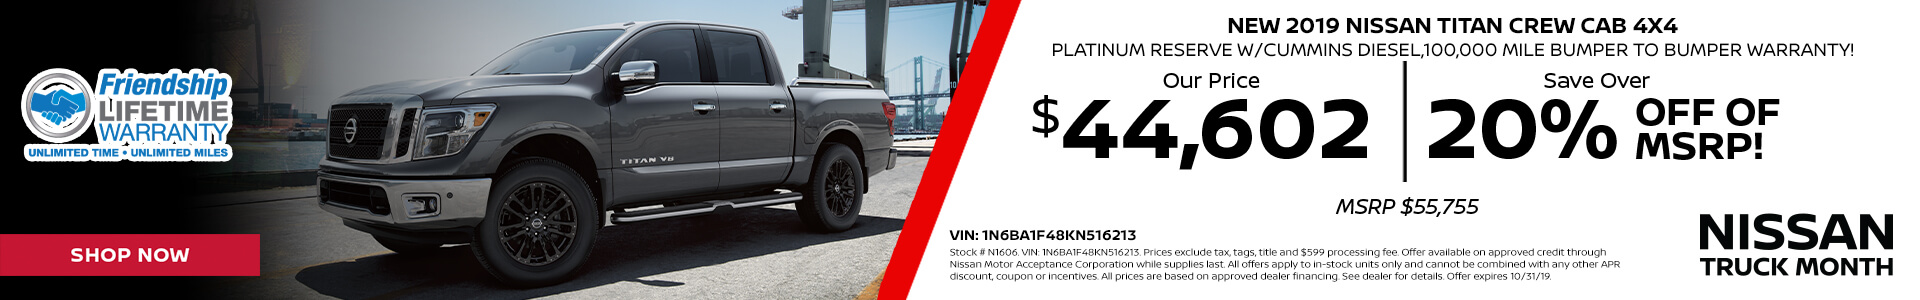 Nissan Titan $44,602 Purchase